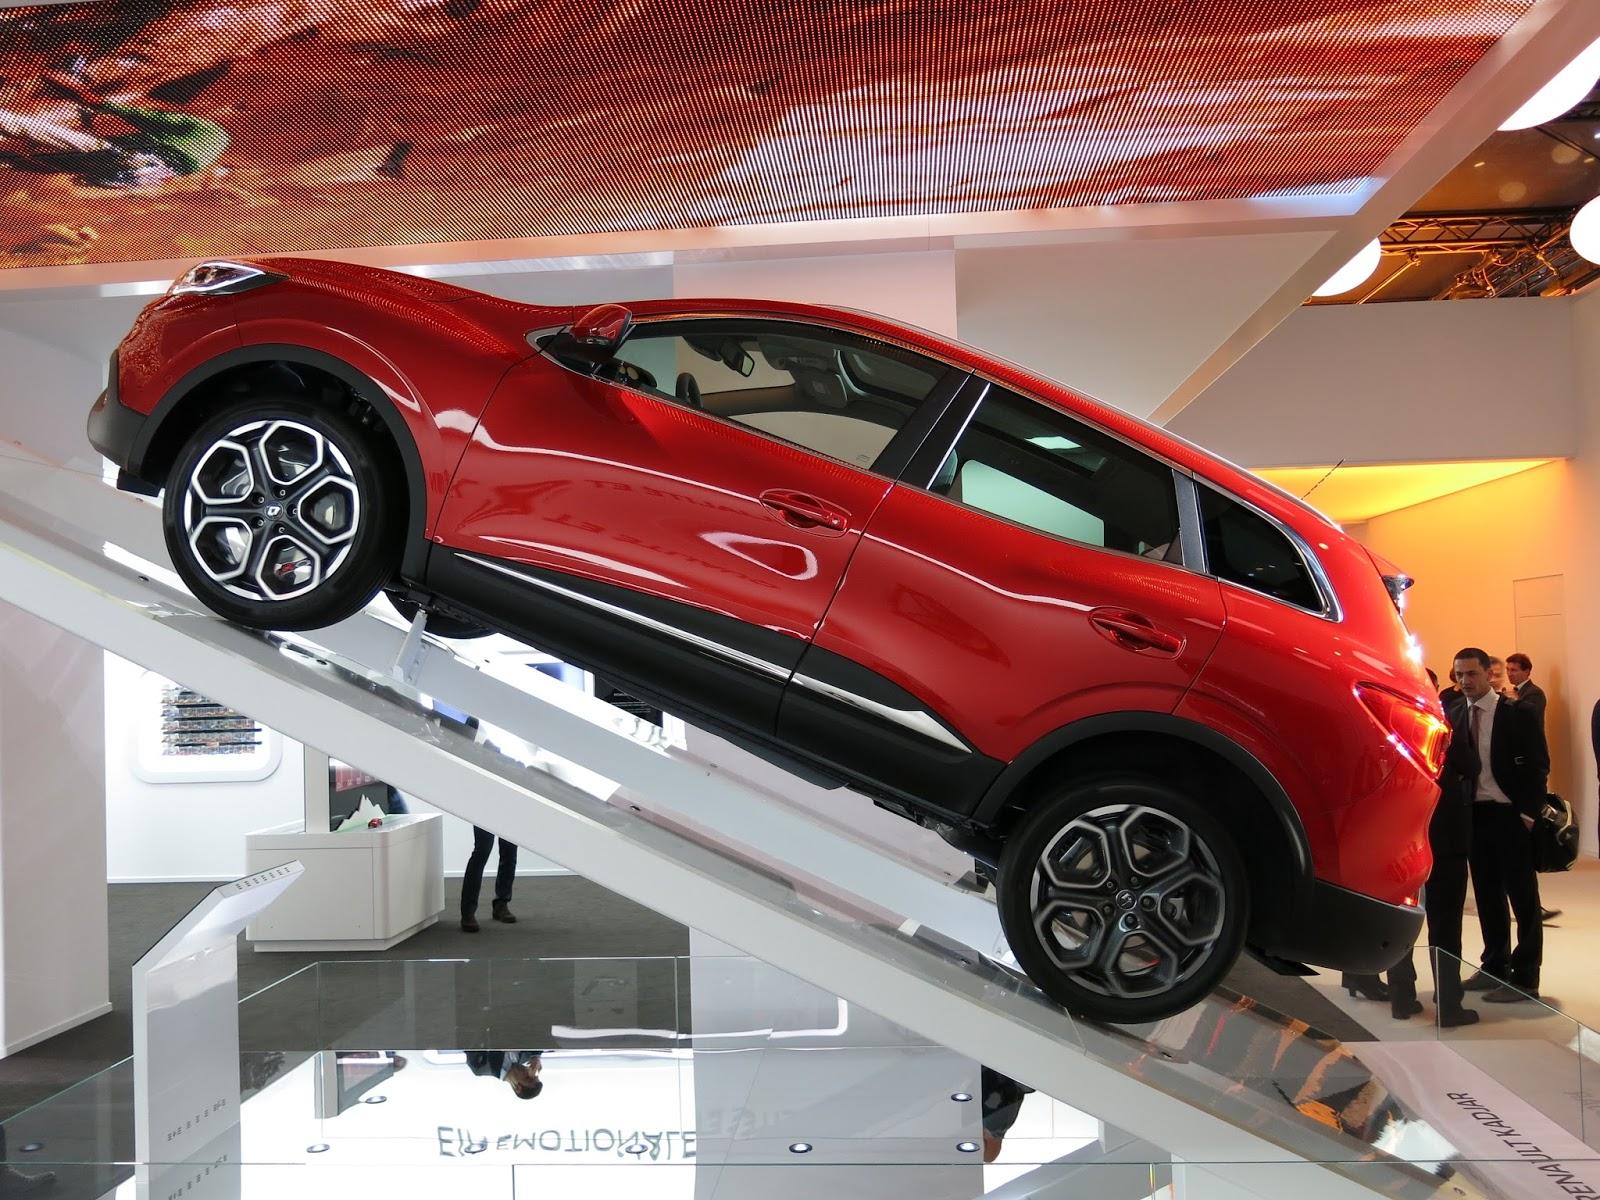 Renault%2BKadjar Σήμερα στην αυτοκίνηση ο Cambiasso θα δει από κοντά το νέο Renault Kadjar